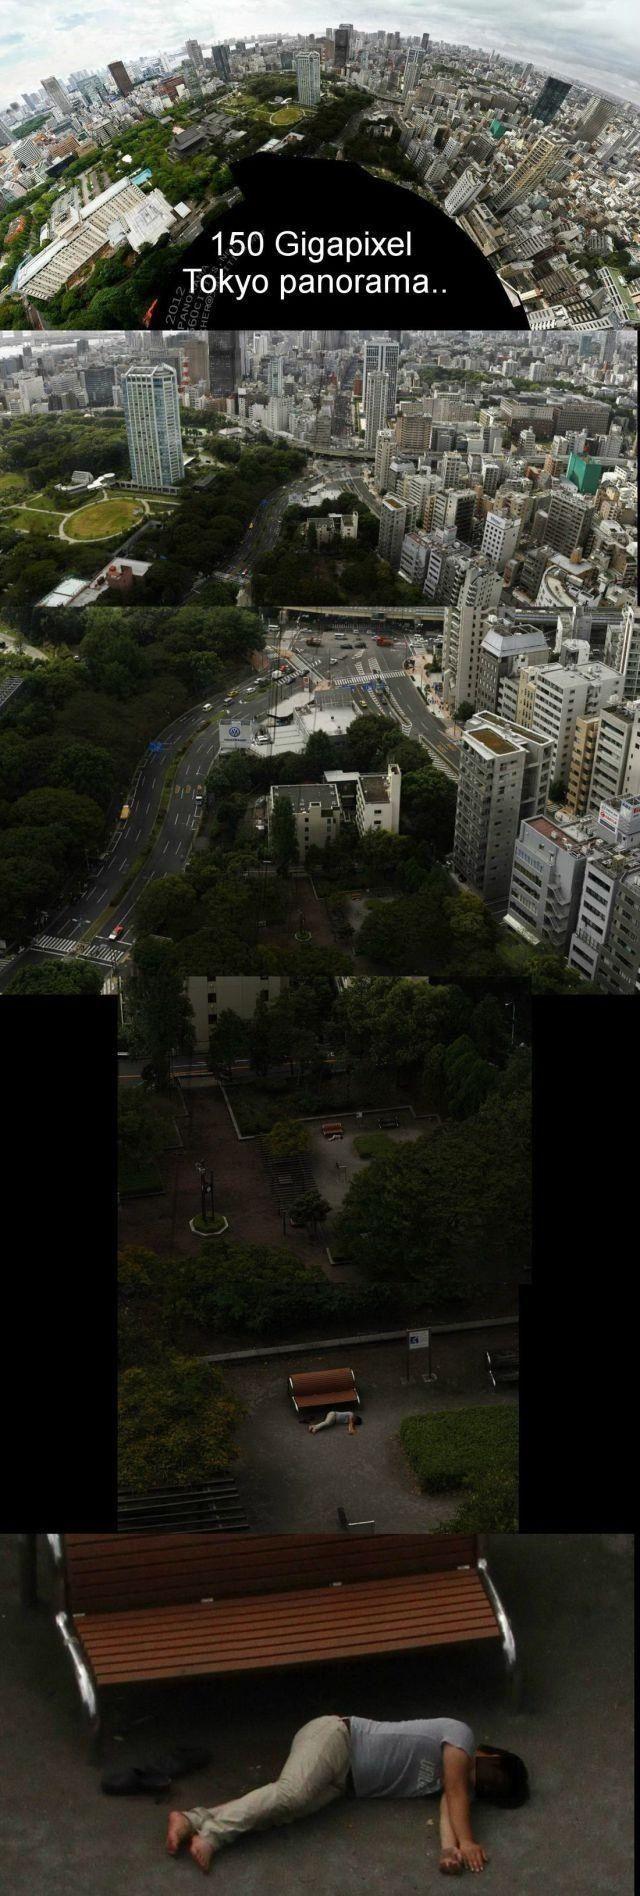 Gigapixels - Tokyo - Ça (aussi) c'est du pixel !! - Page 2 Tokyo11